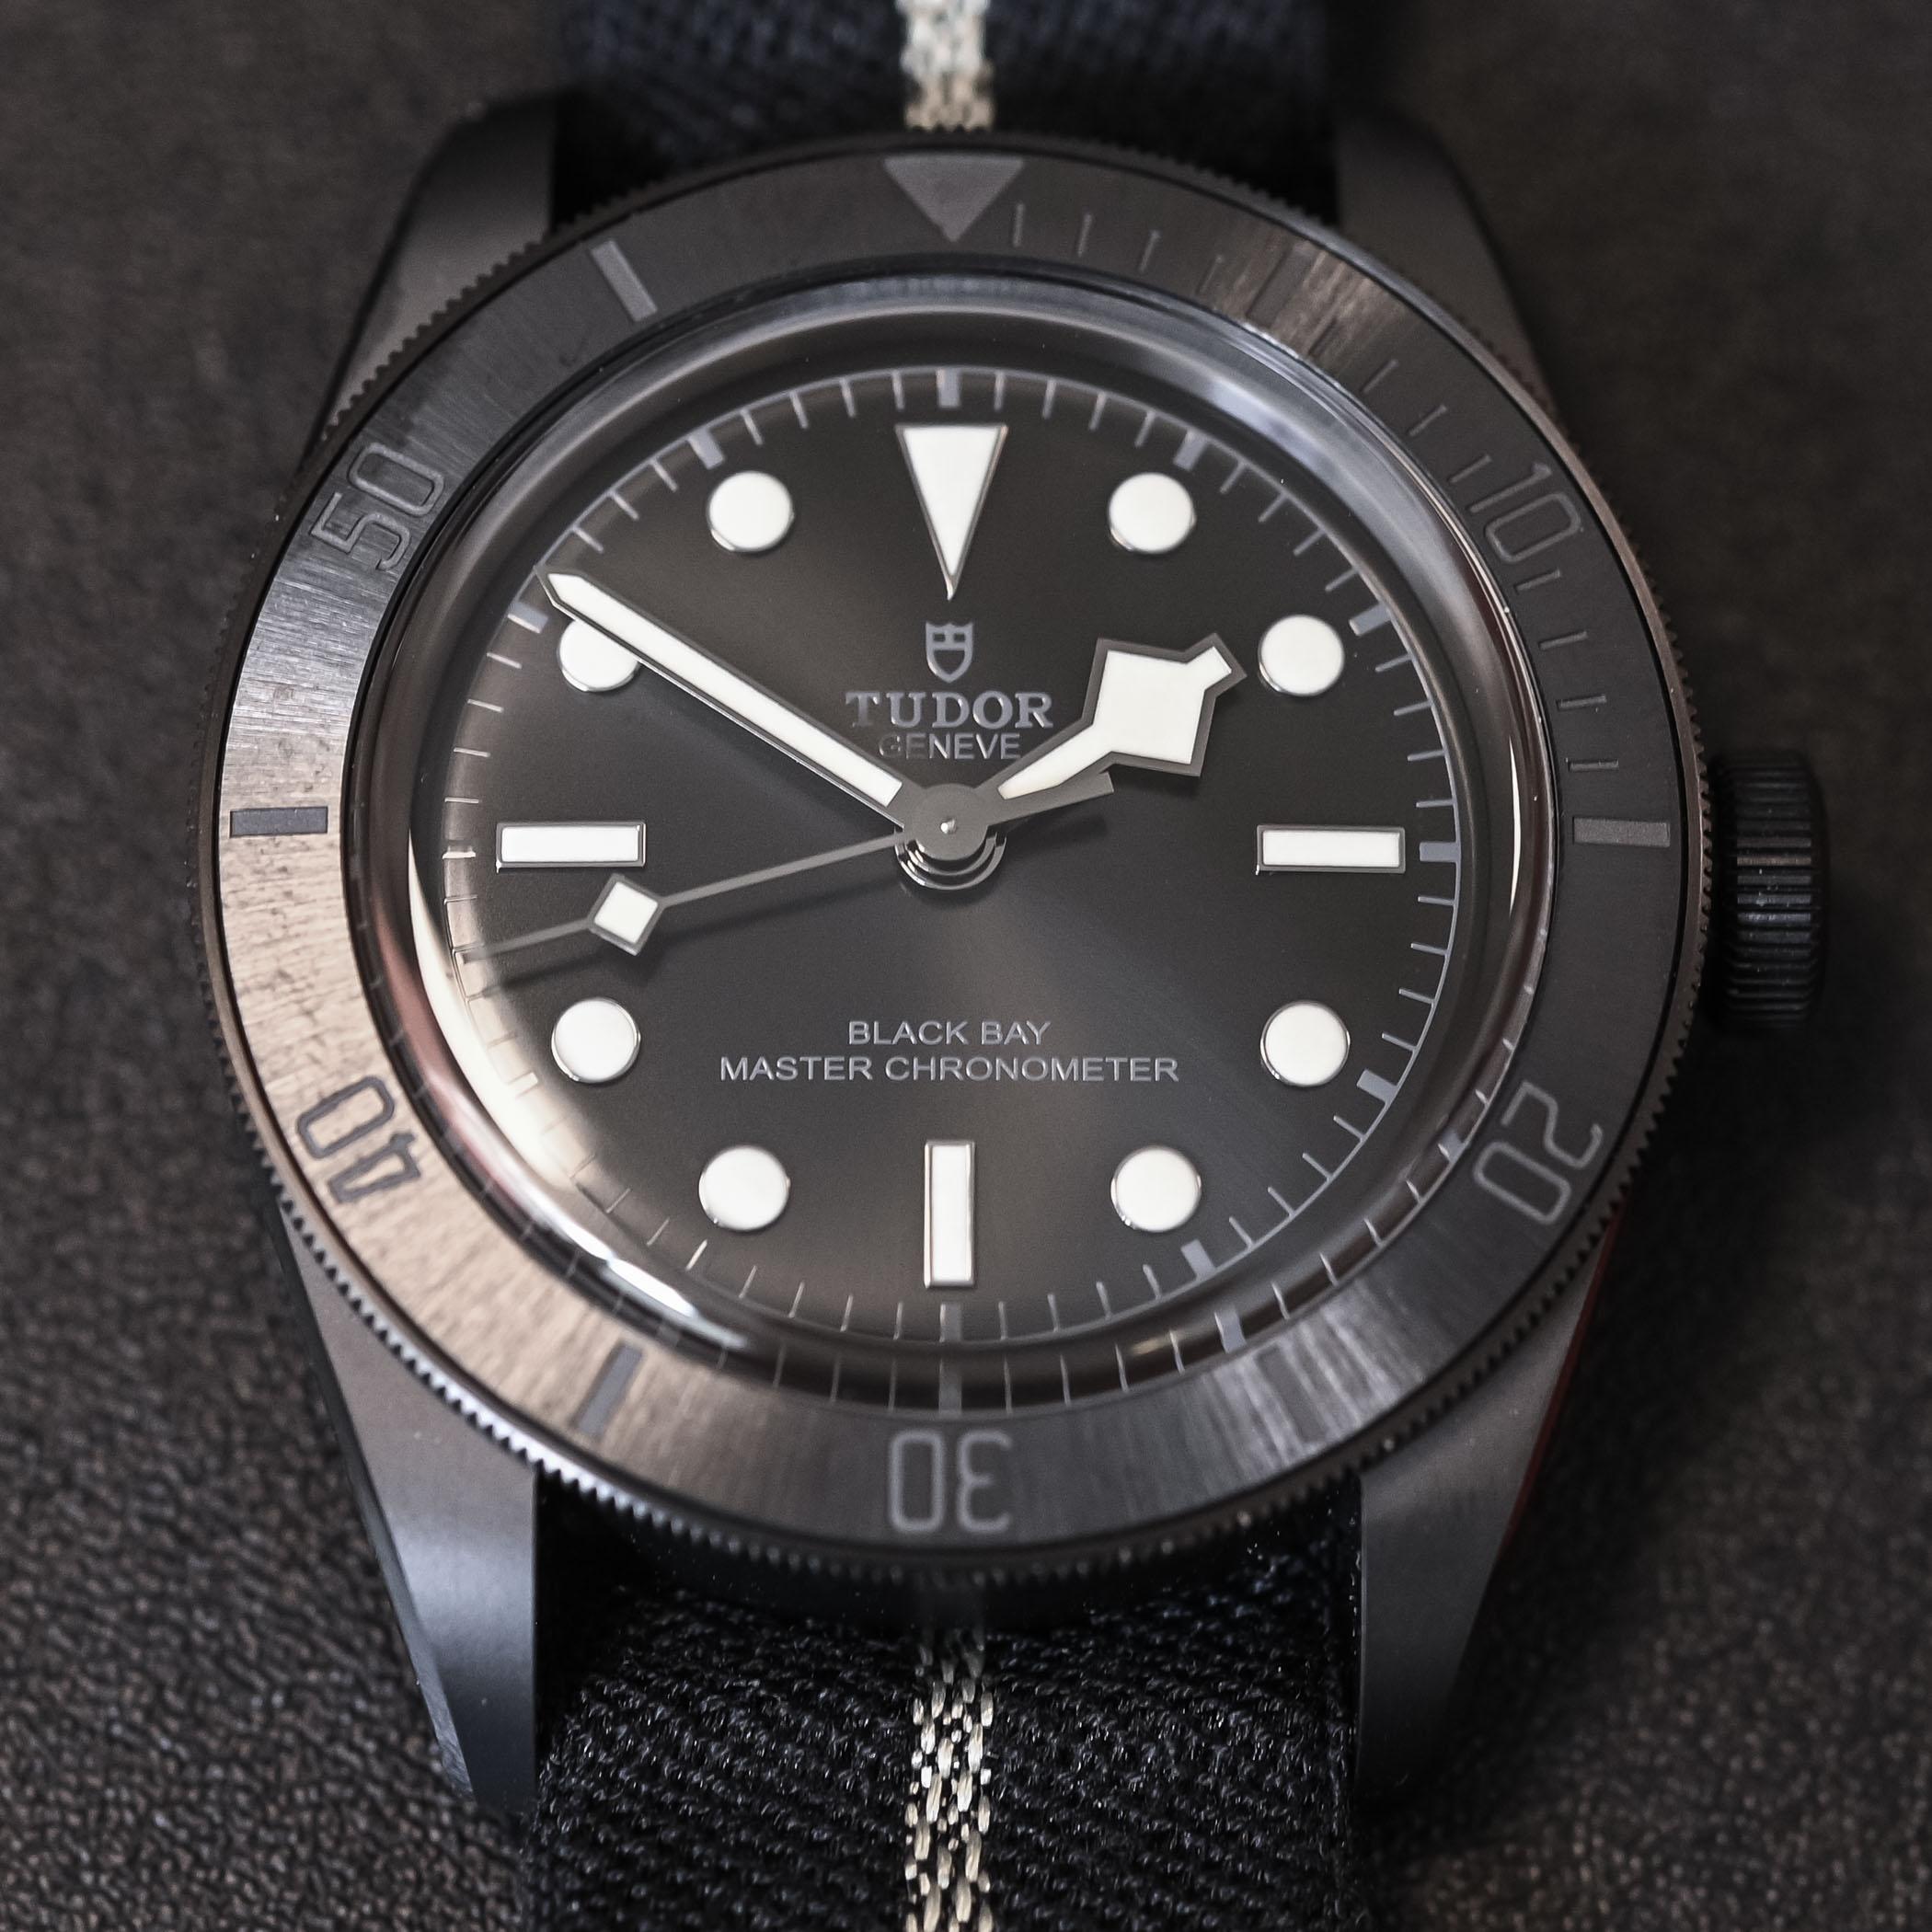 Tudor Black Bay Ceramic Master Chronometer METAS M79210CNU-0001 - review - 2